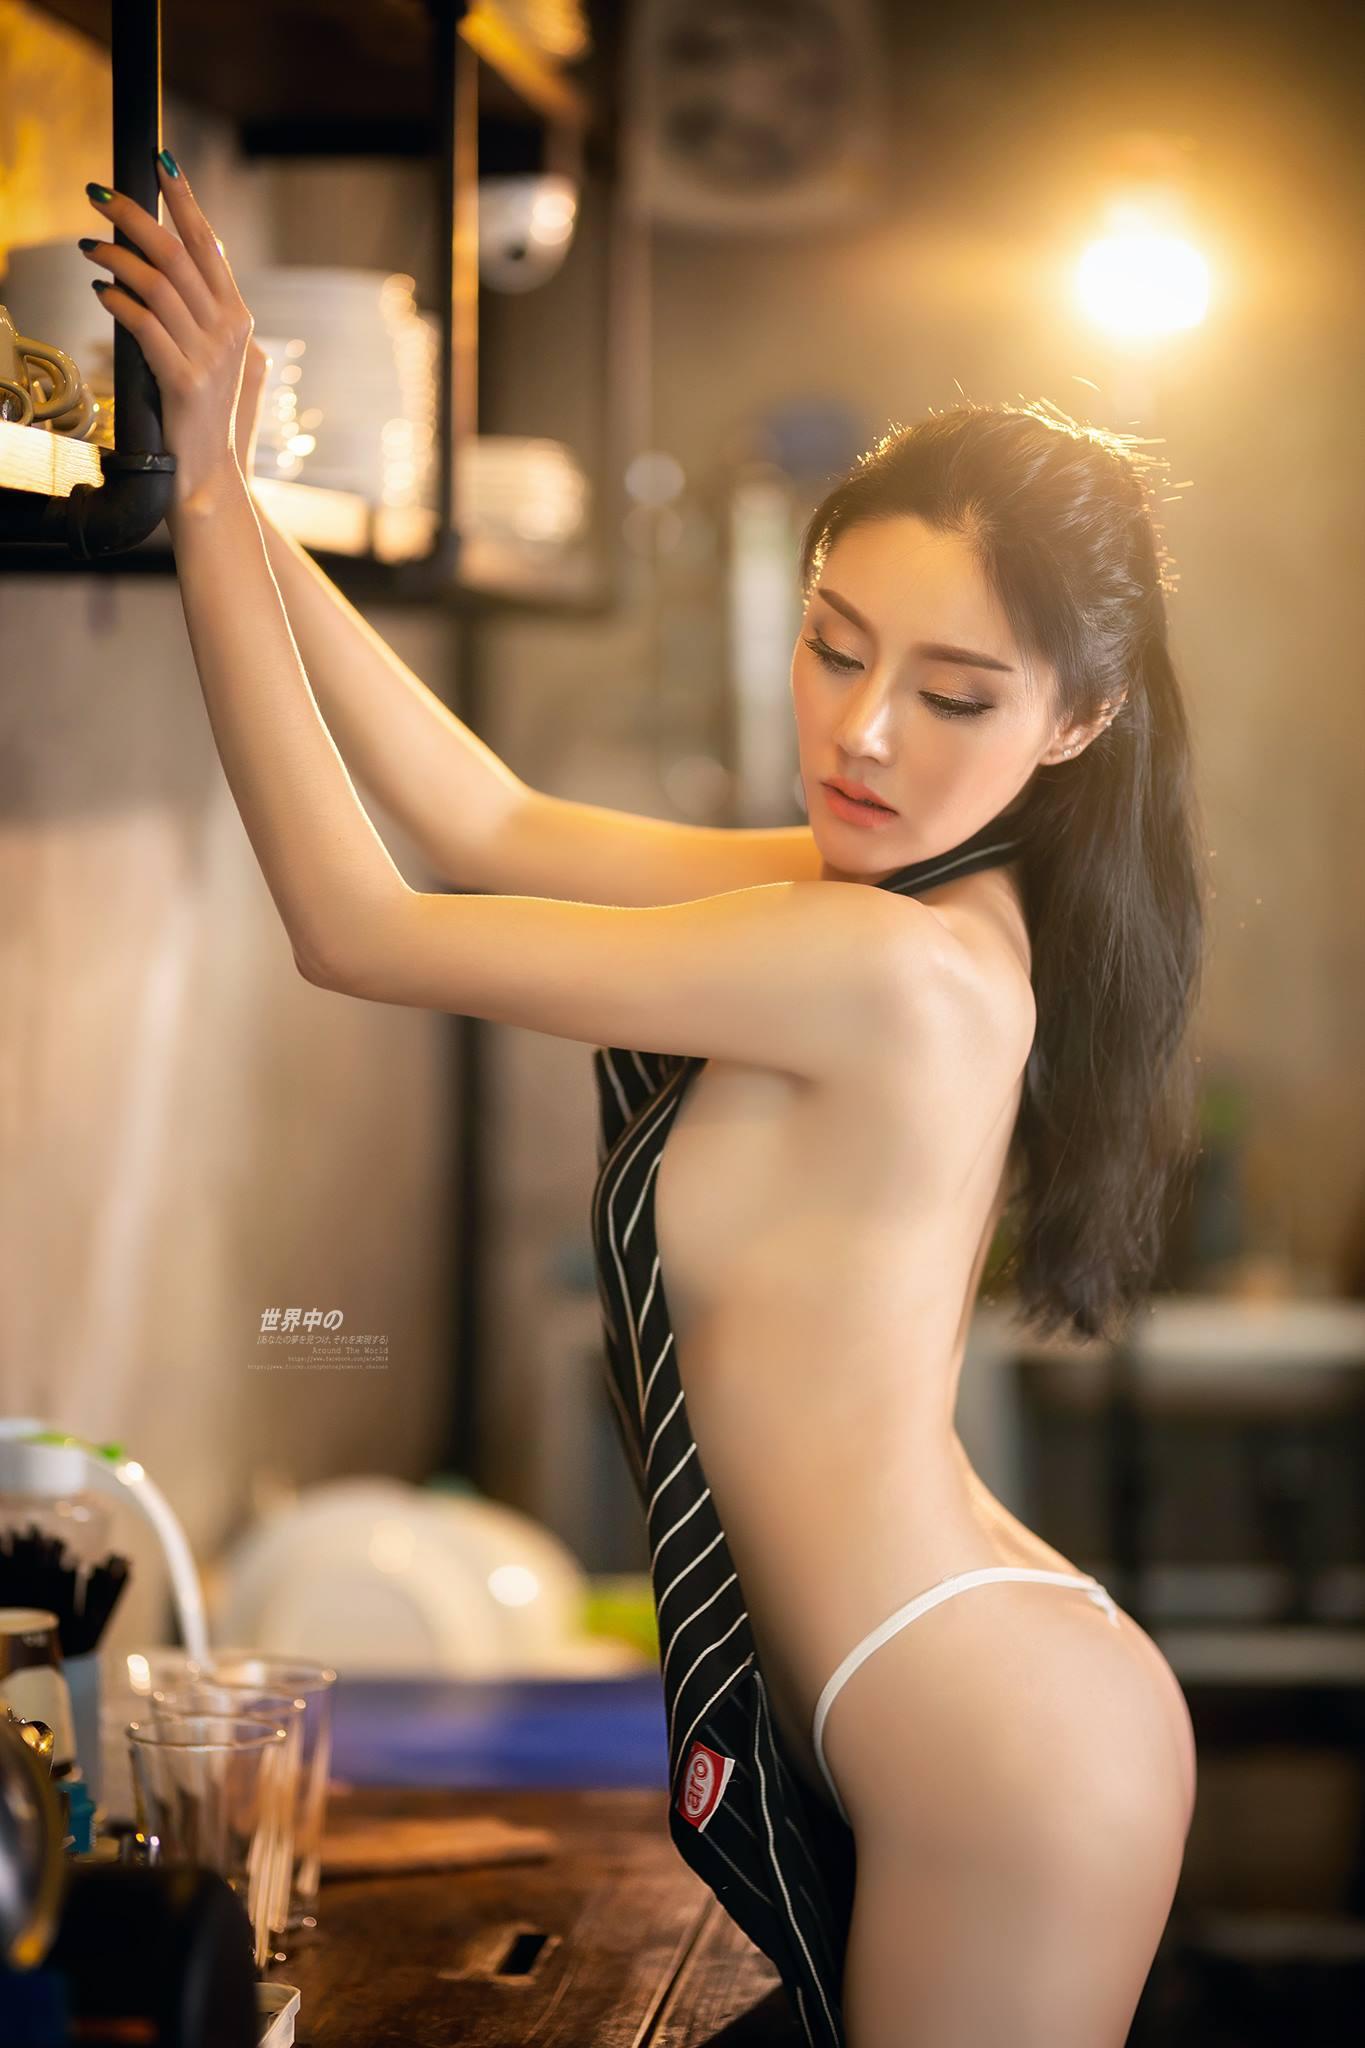 Coffee or Me - Orn Jaidee